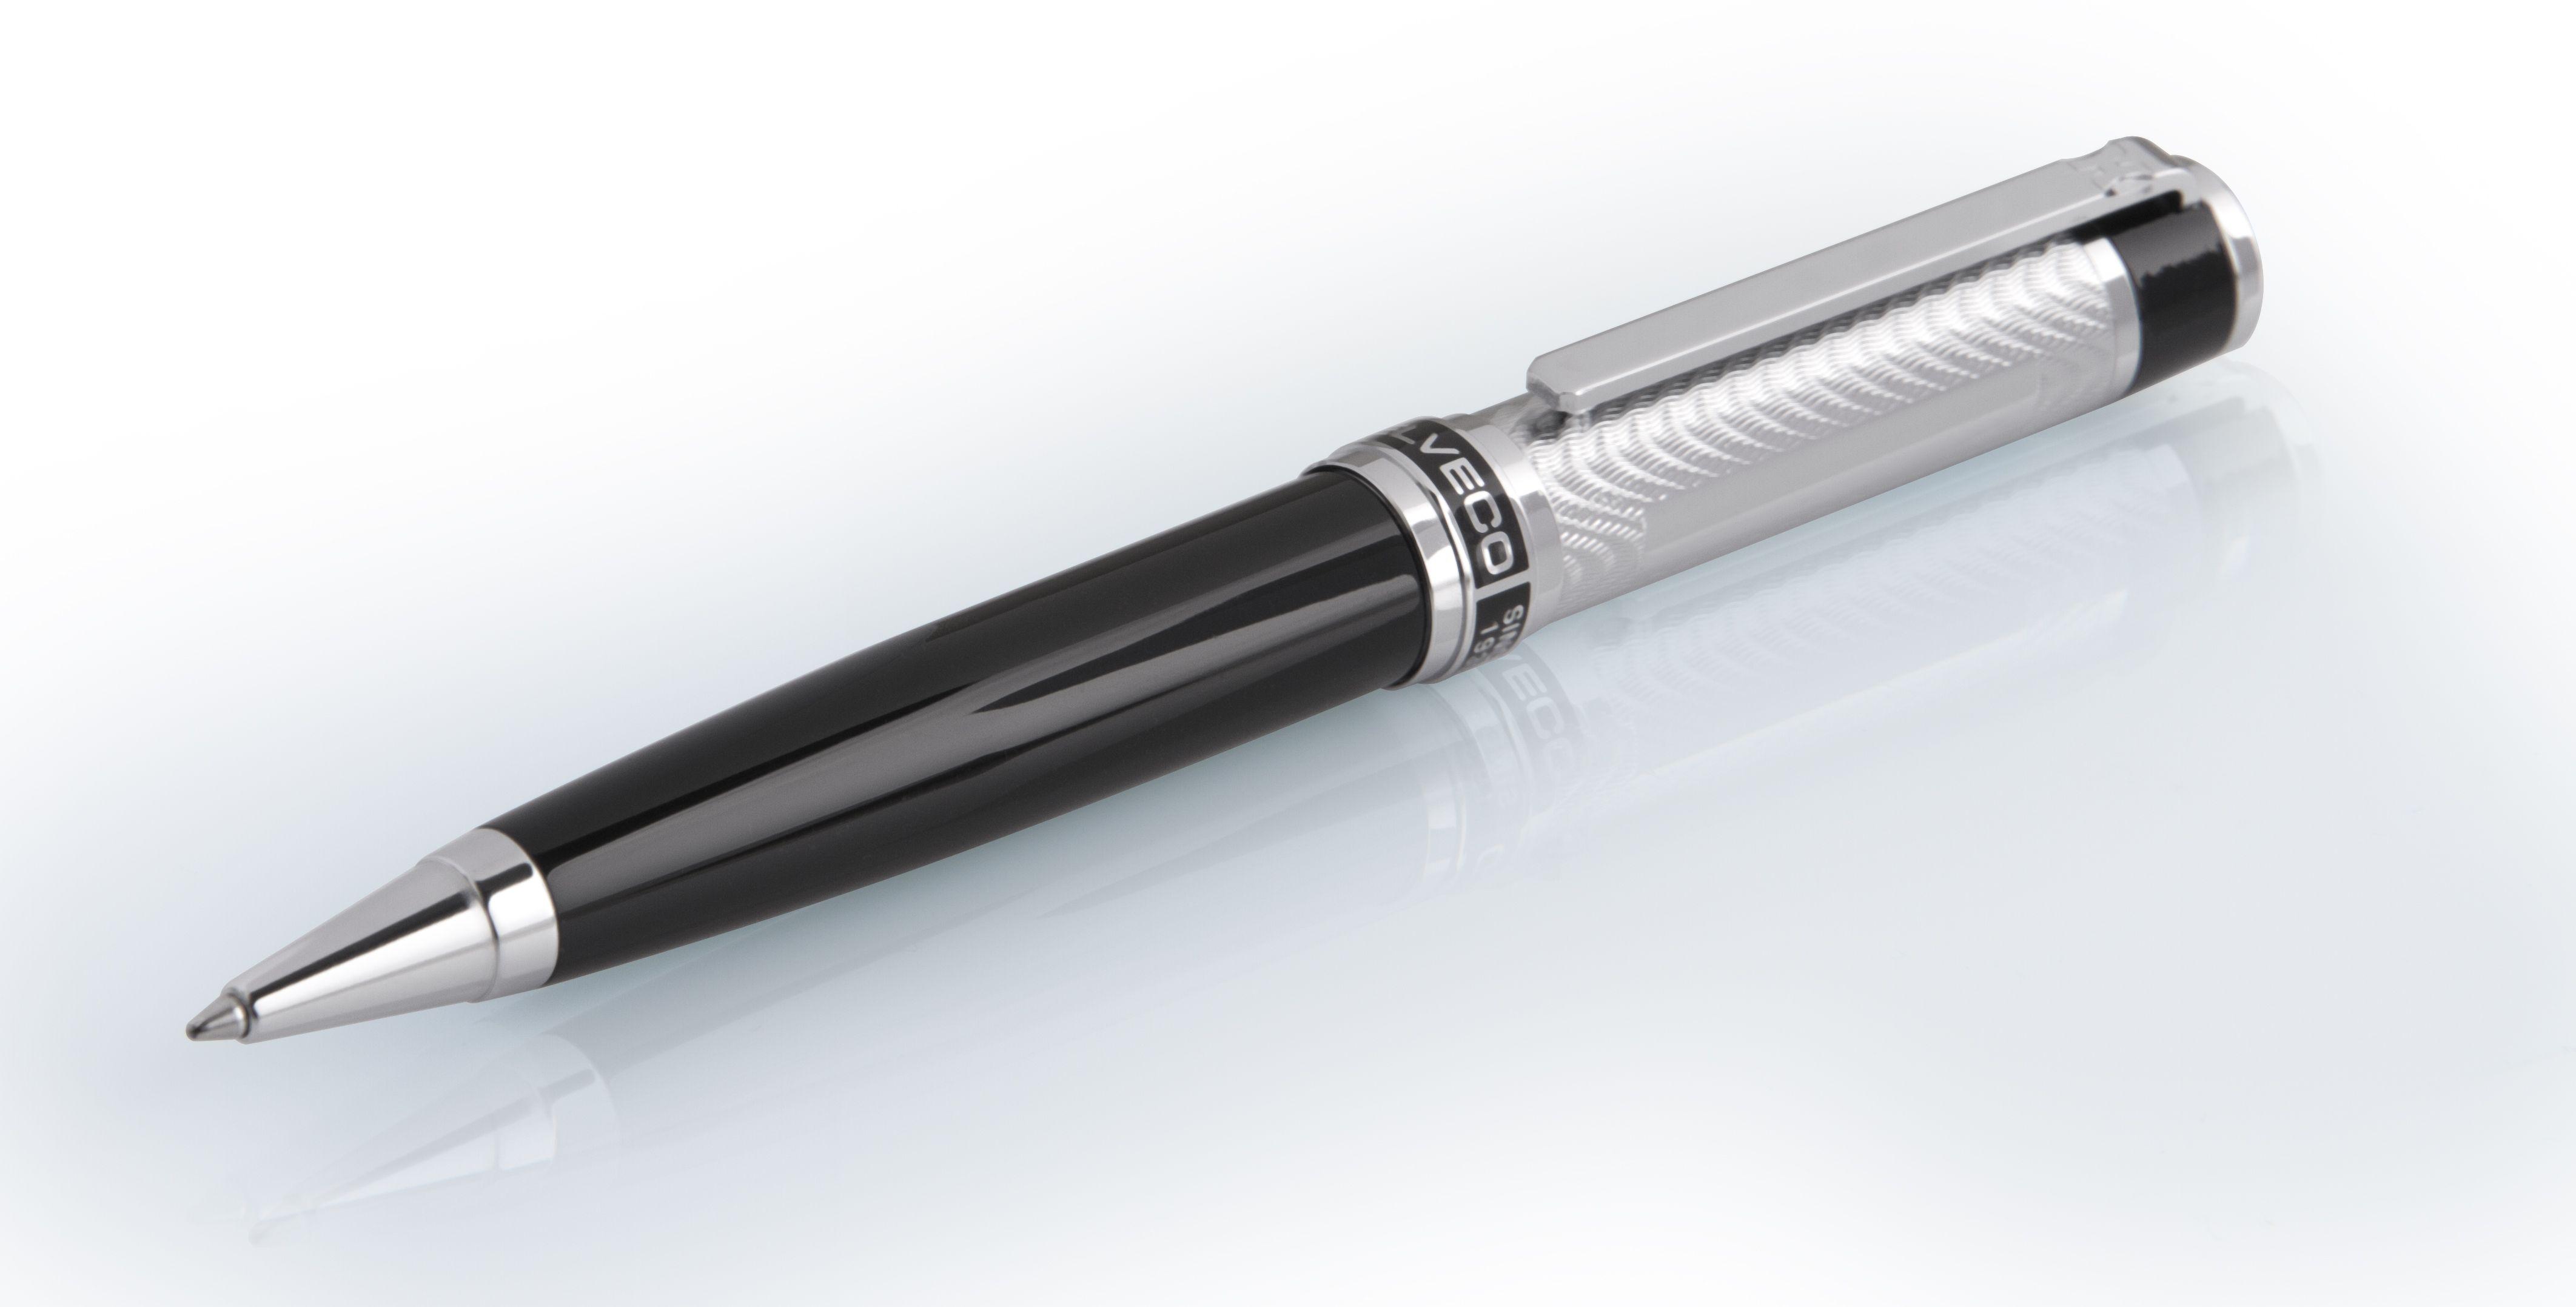 The WHEEL CROWN Collection HBP09670 Germanmade ball pen